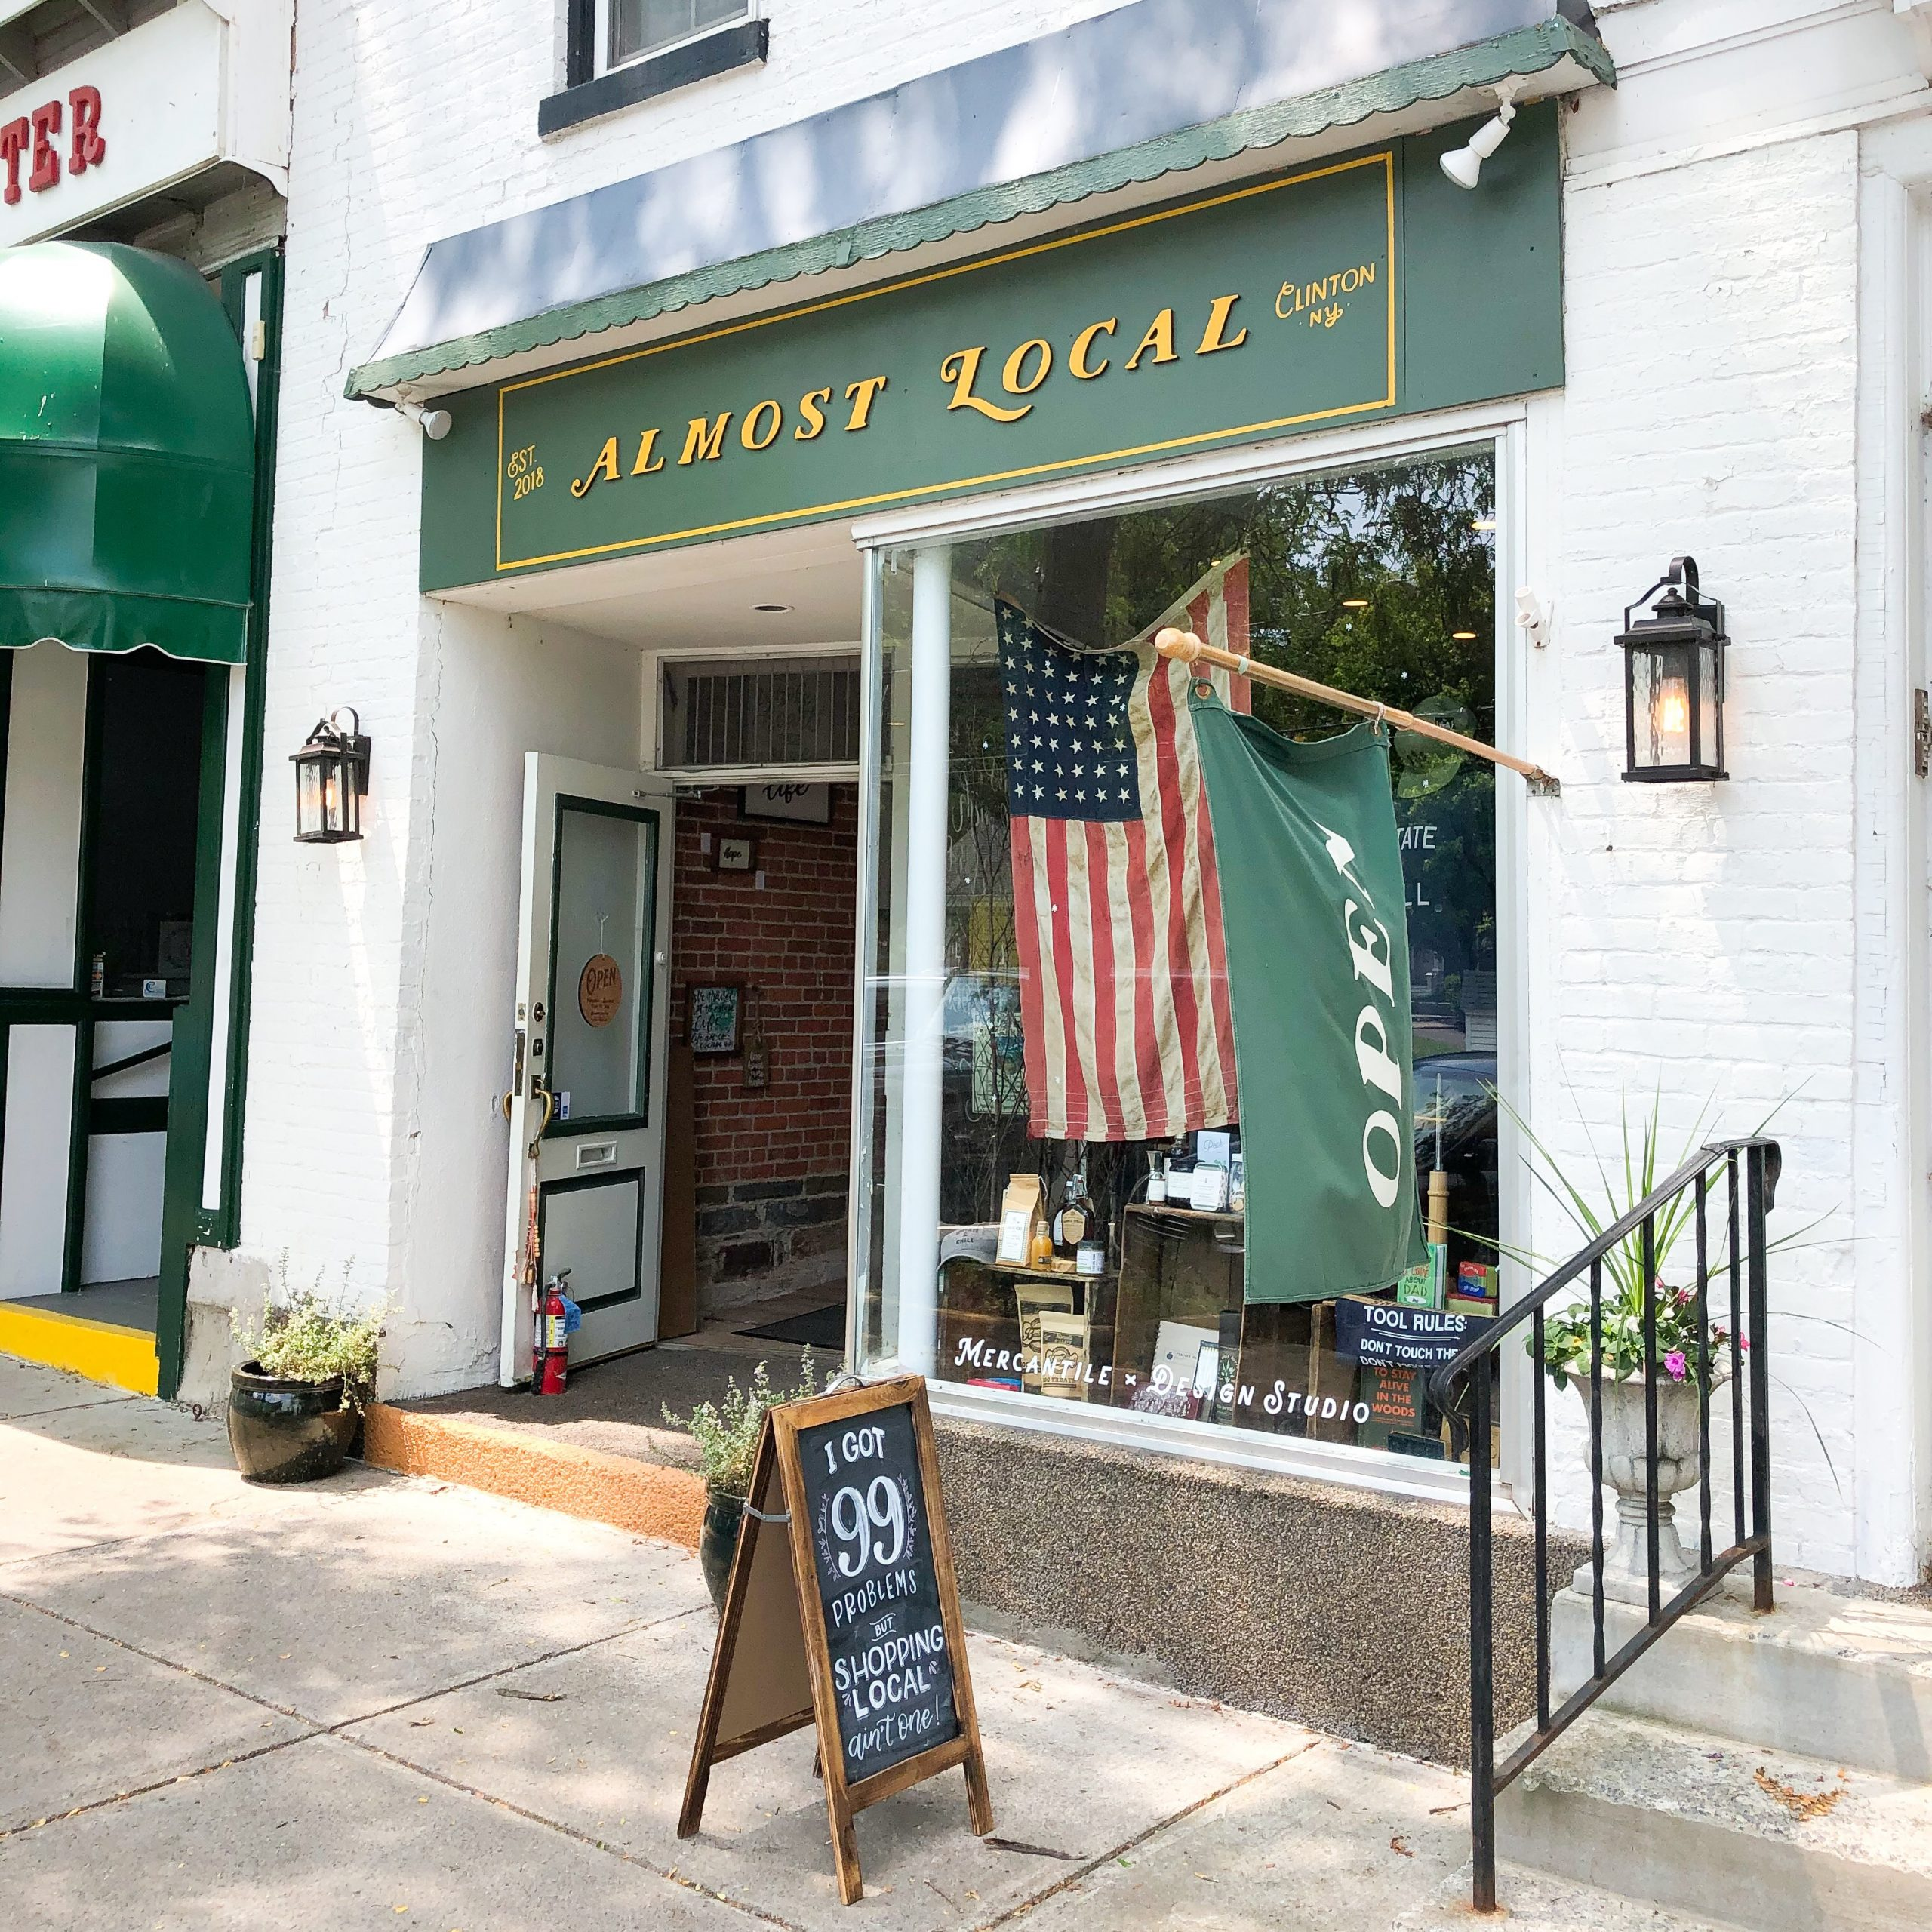 Almost Local Shop in Clinton